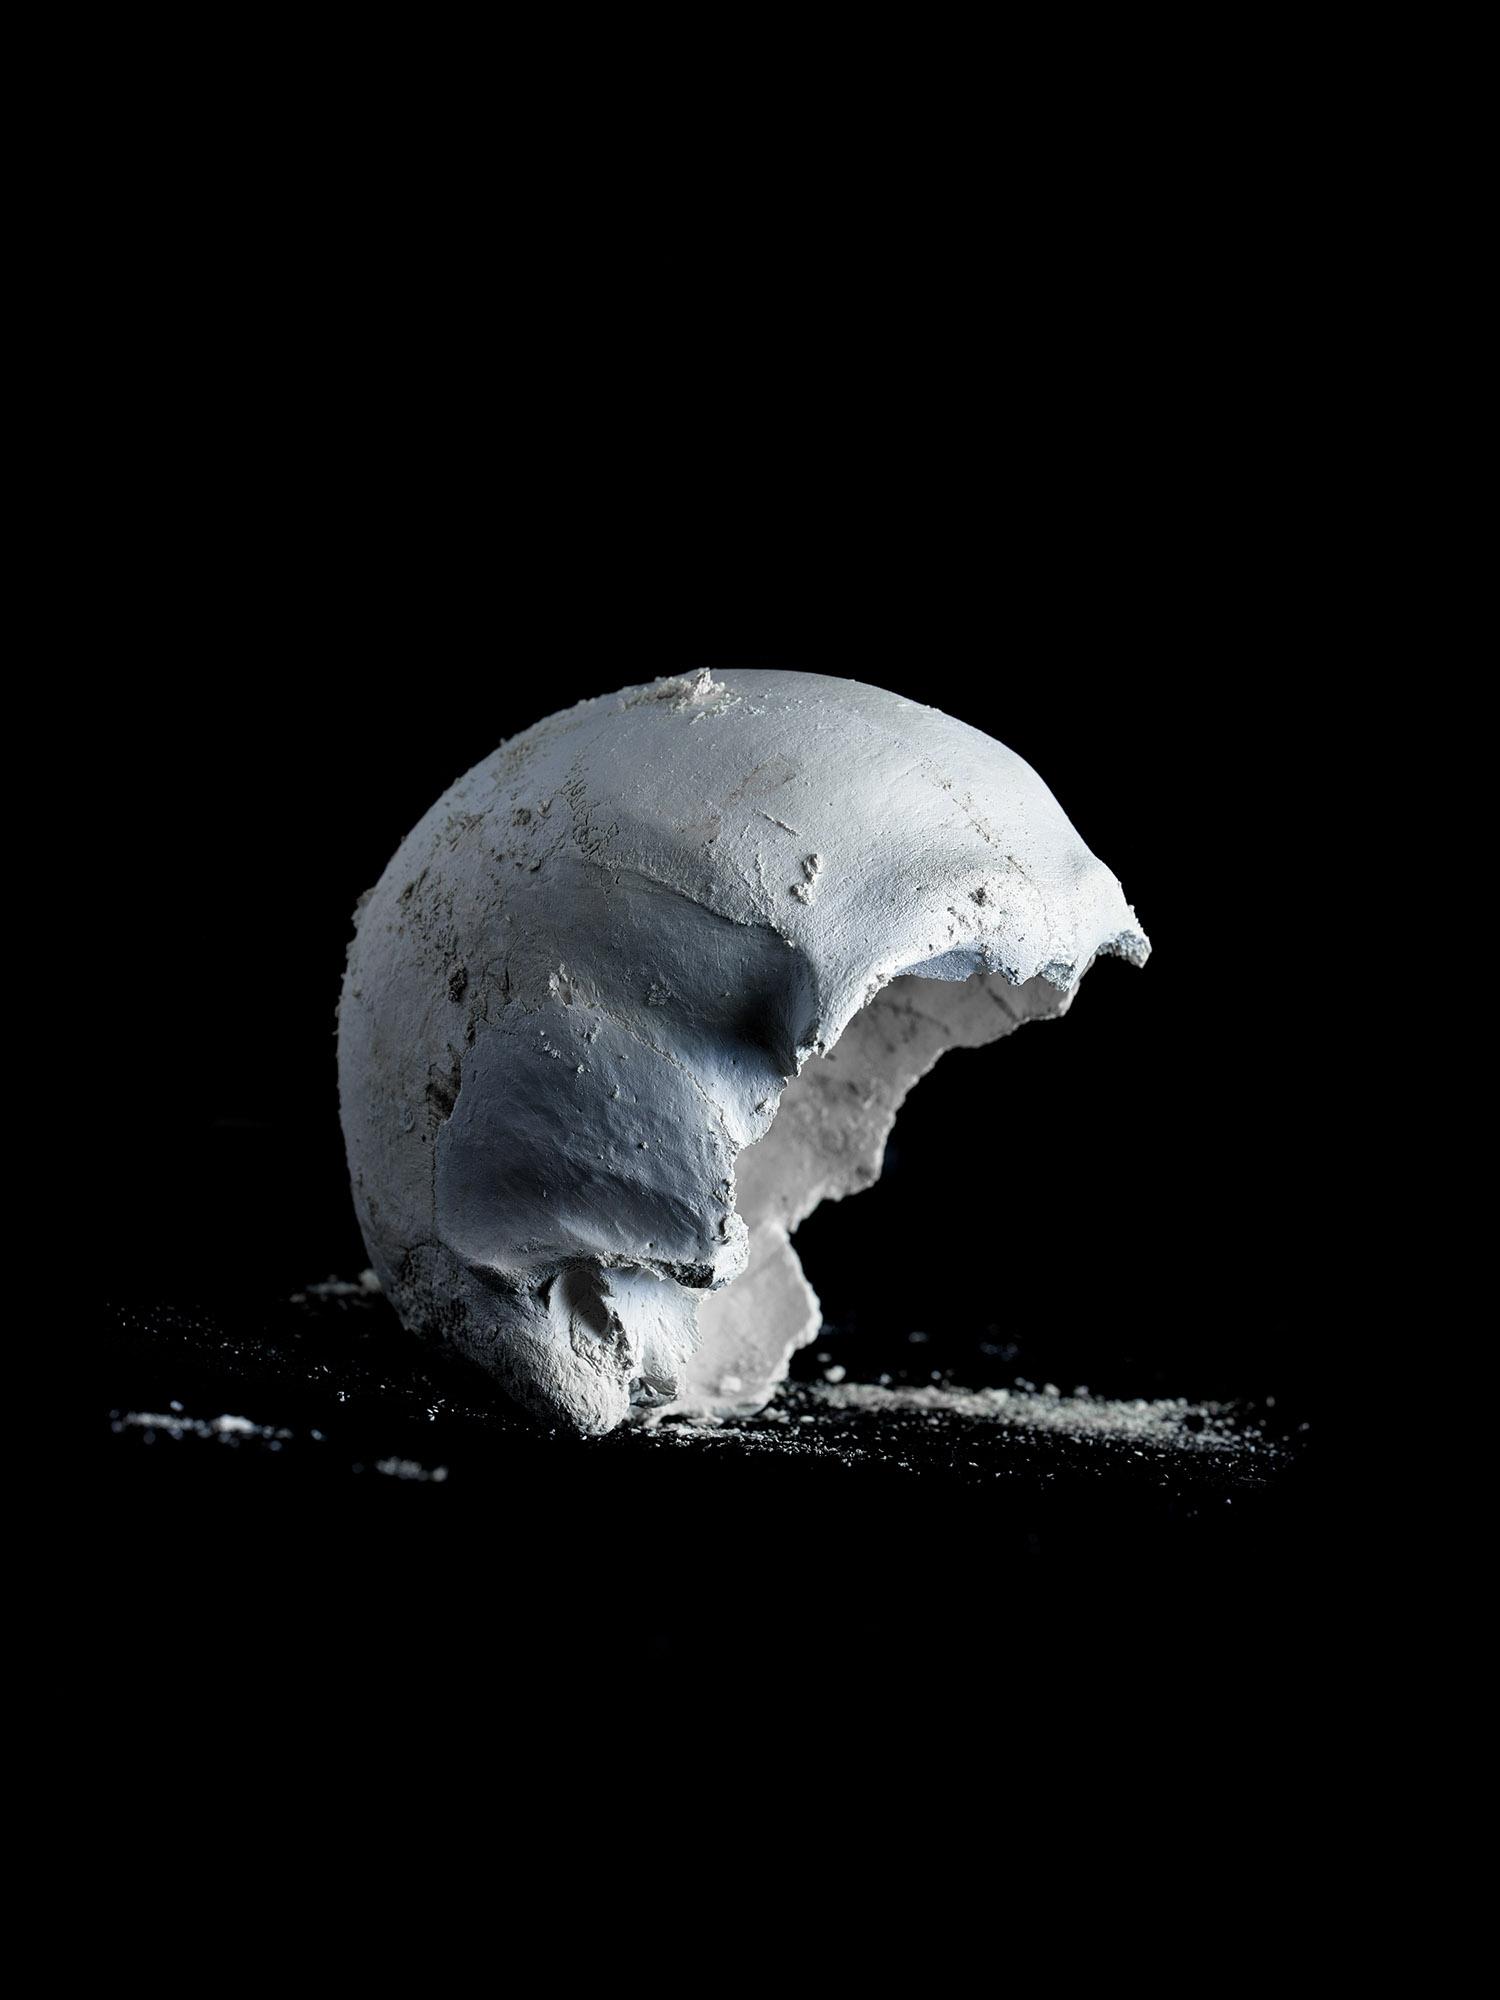 Human Skull Processed by Alkaline Hydrolysis, UCLA, Los Angeles, California, 2017